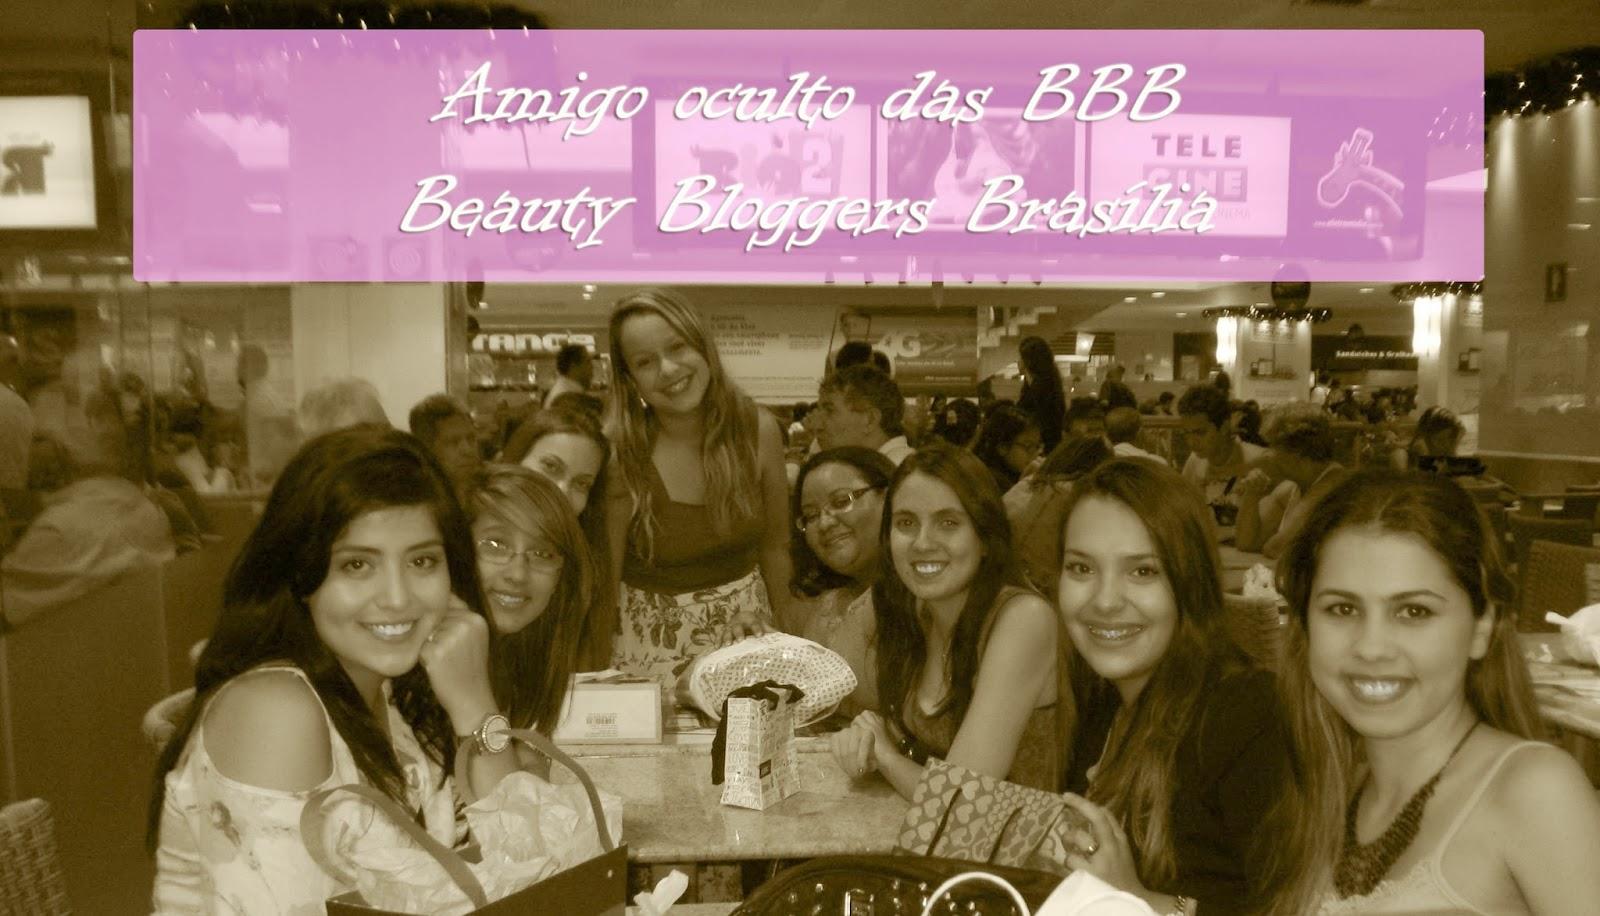 Amigo oculto das BBB – Beauty Bloggers Brasília